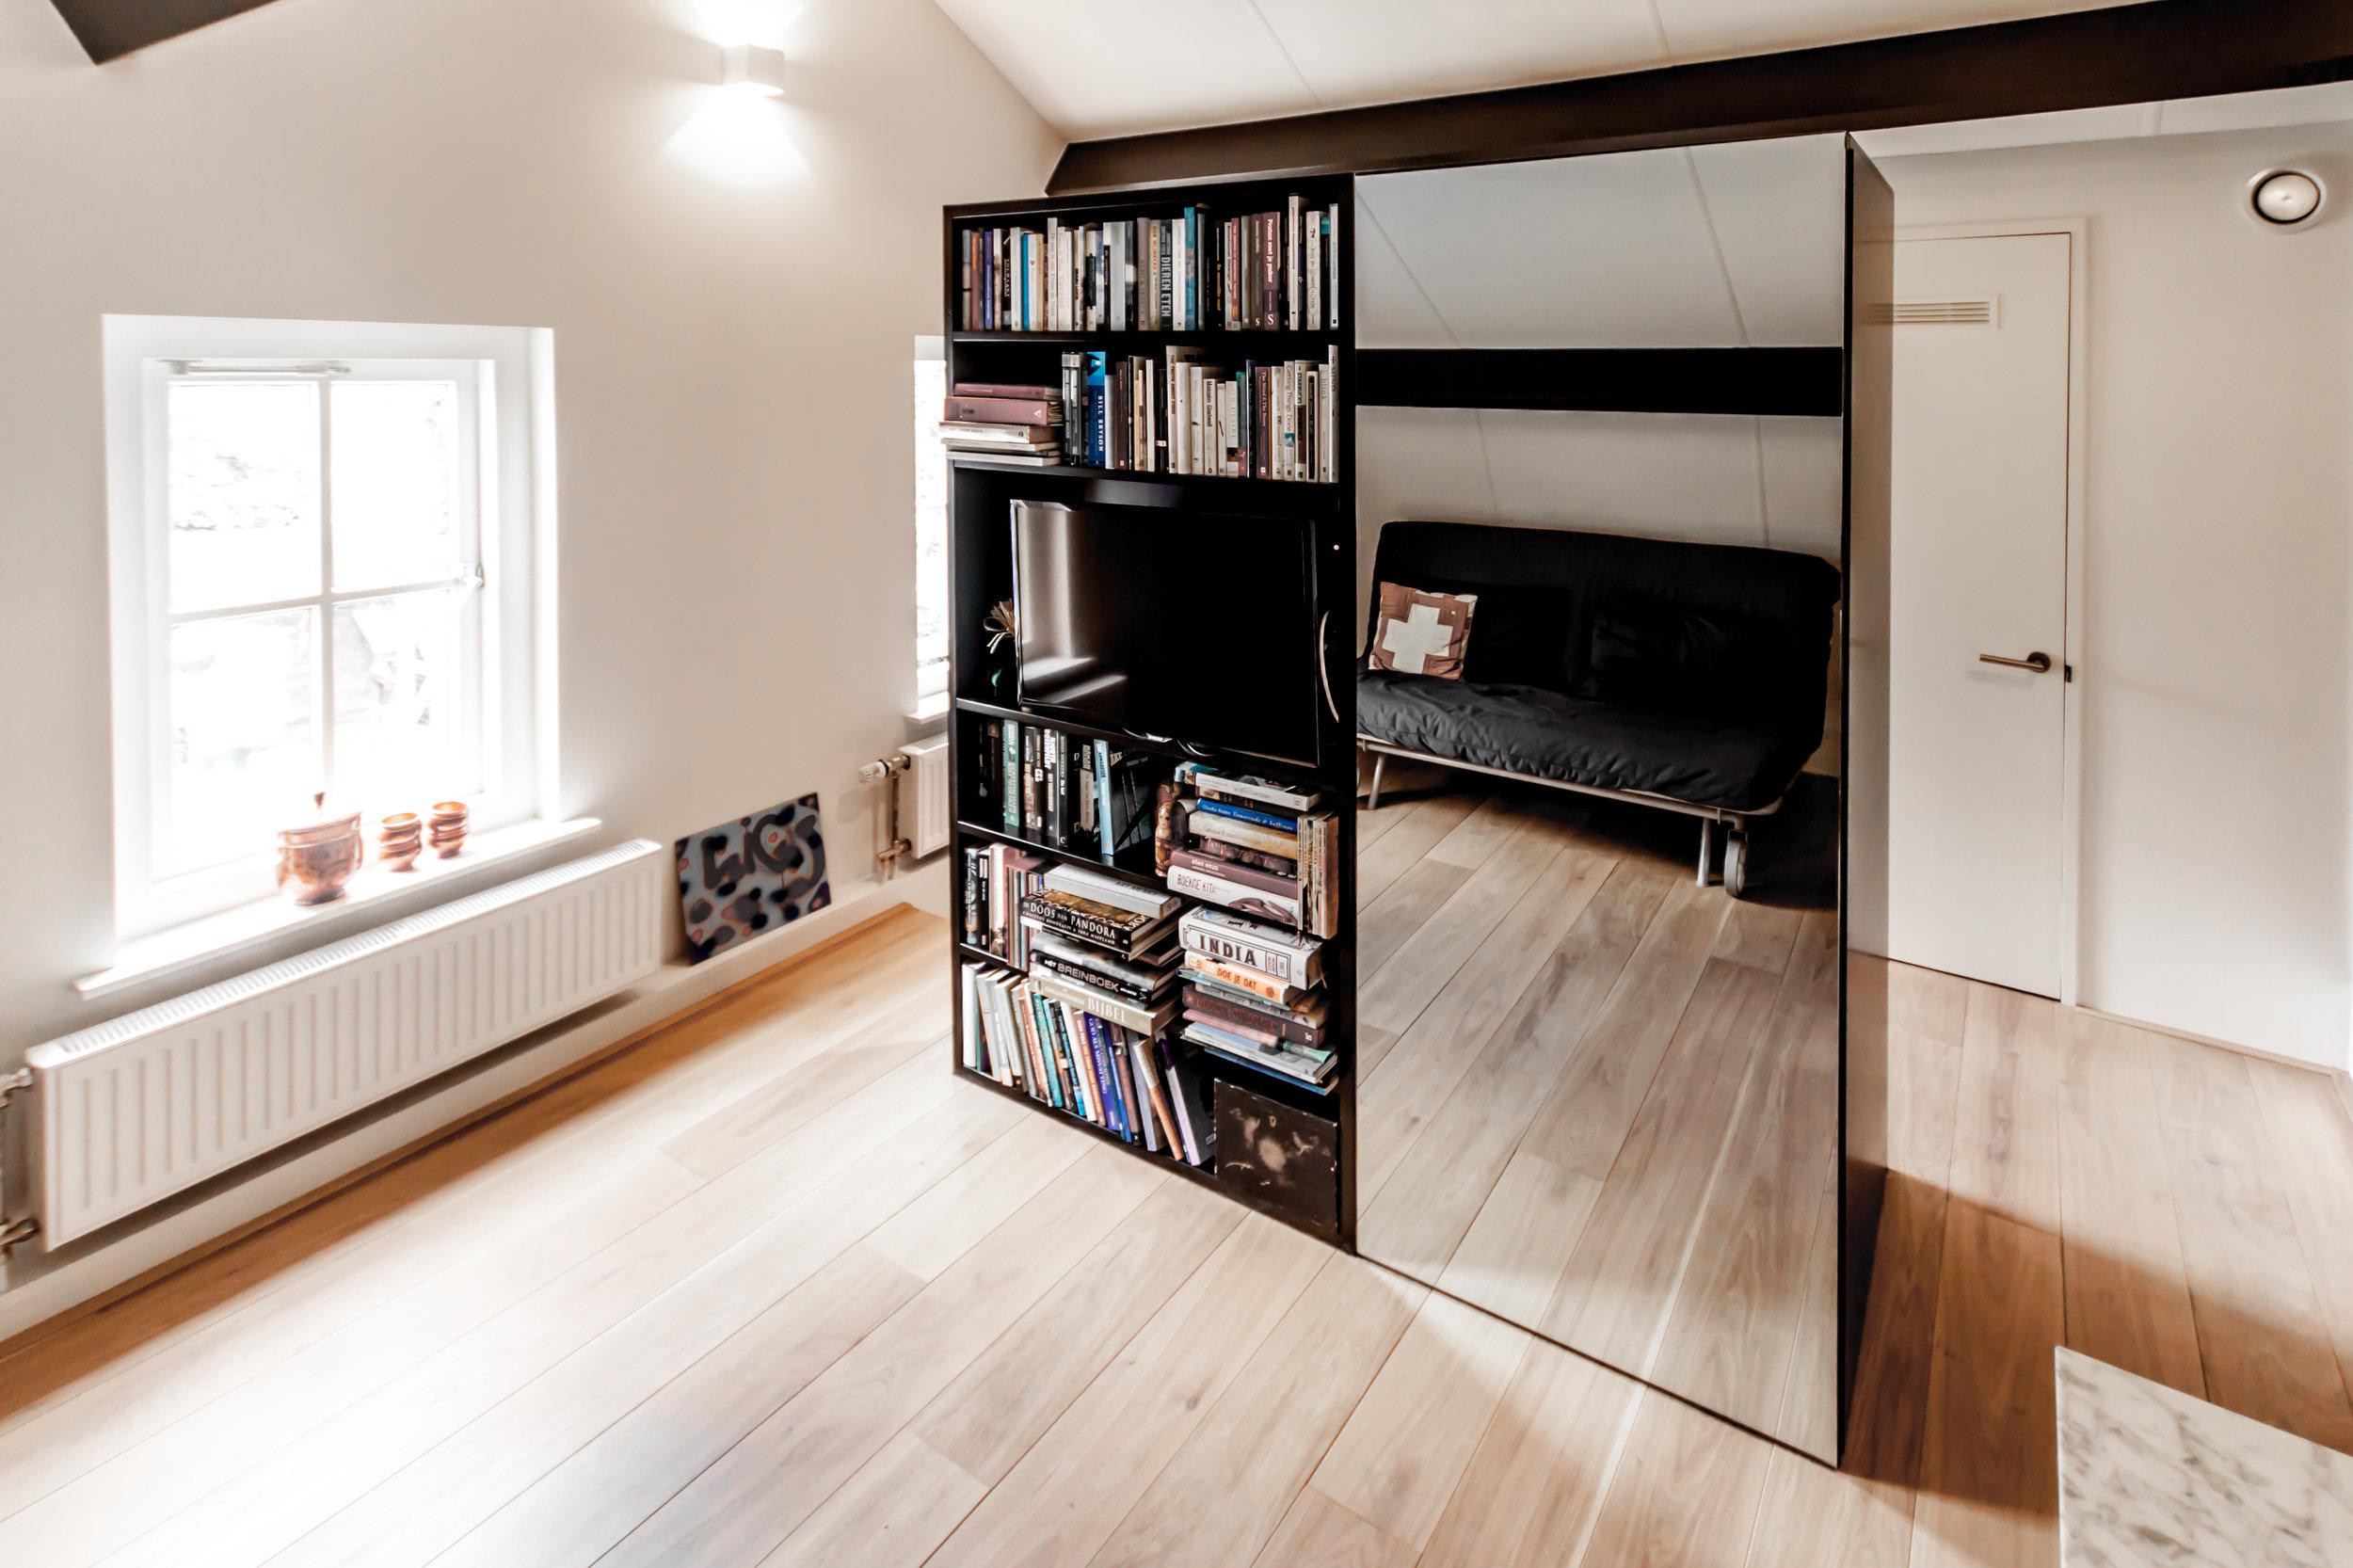 Gastenvertrek met roomdivider meubel met spiegel, boekenkast en tv.